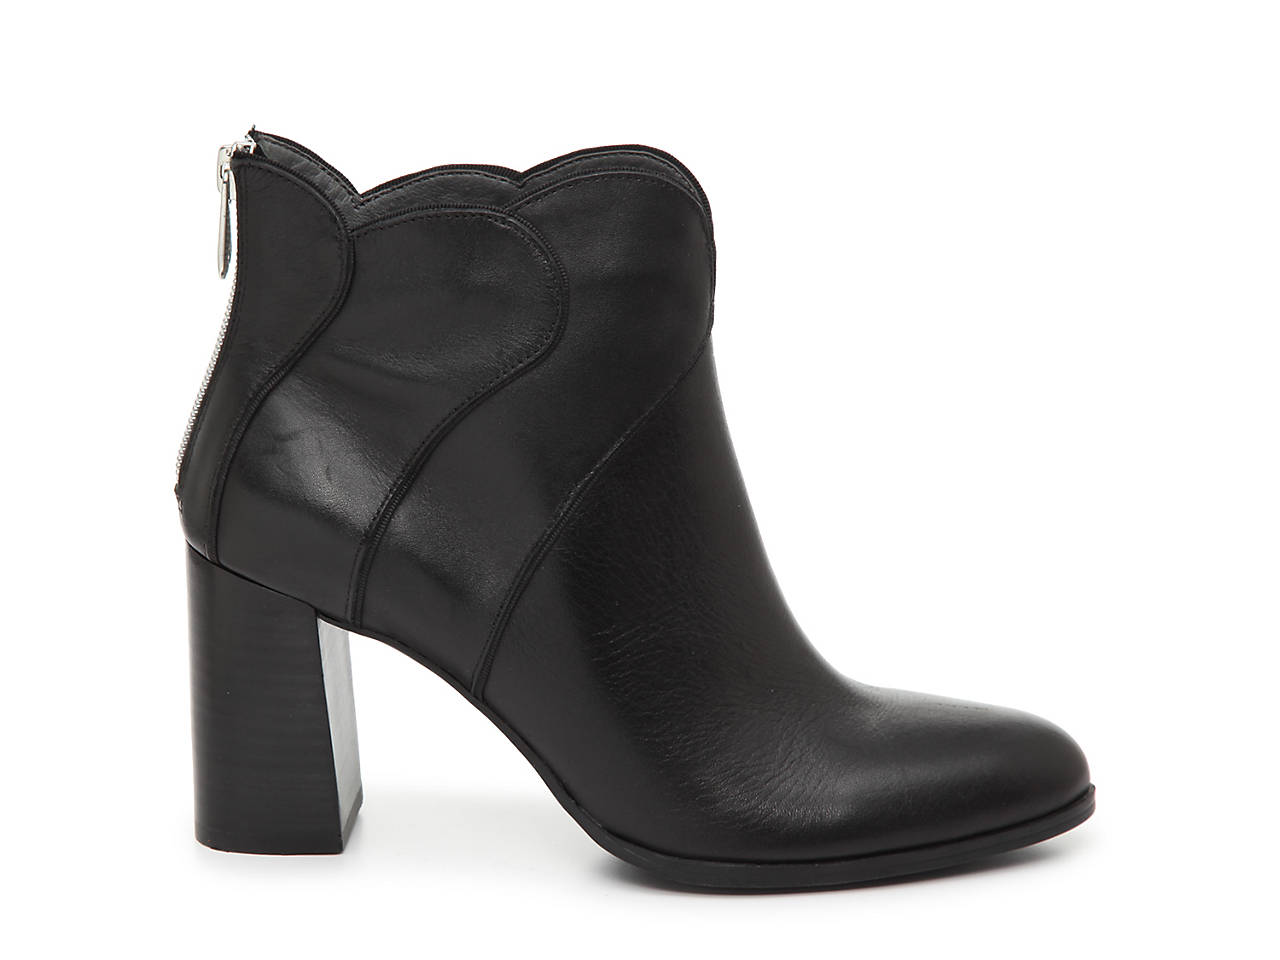 cbf58087131 Adrienne Vittadini Tabby Bootie Women s Shoes